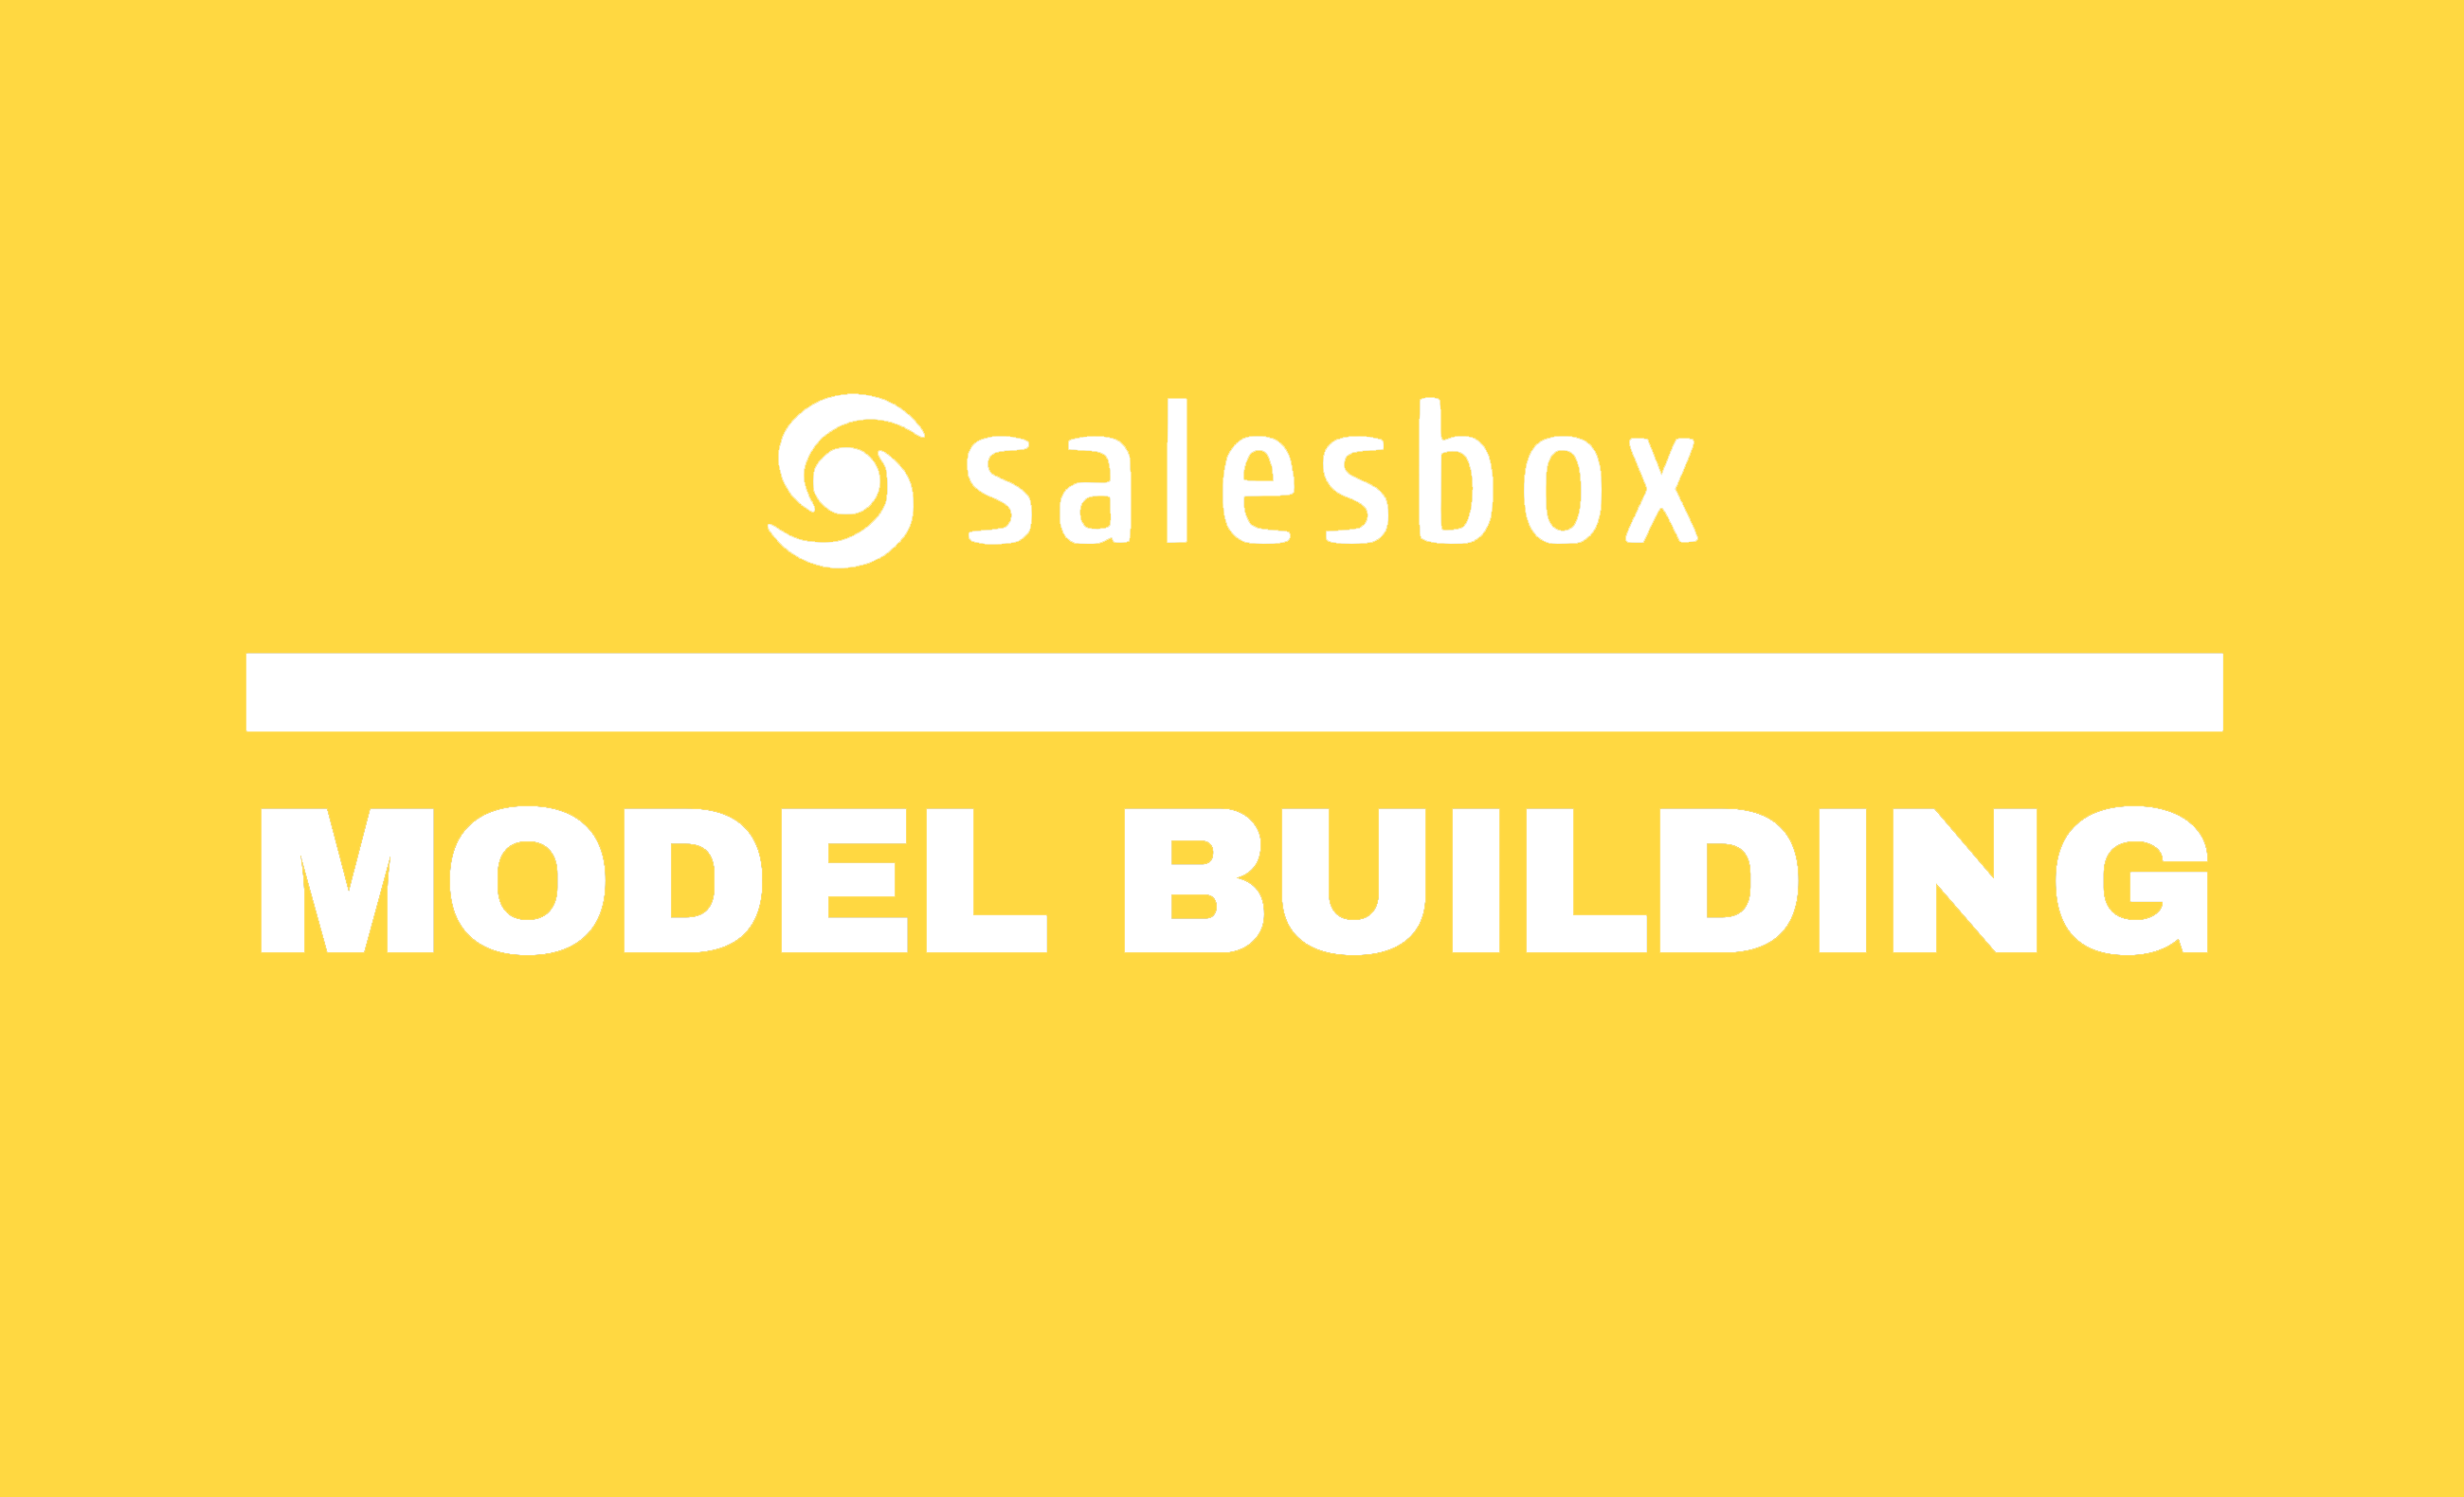 Salesbox Model Building